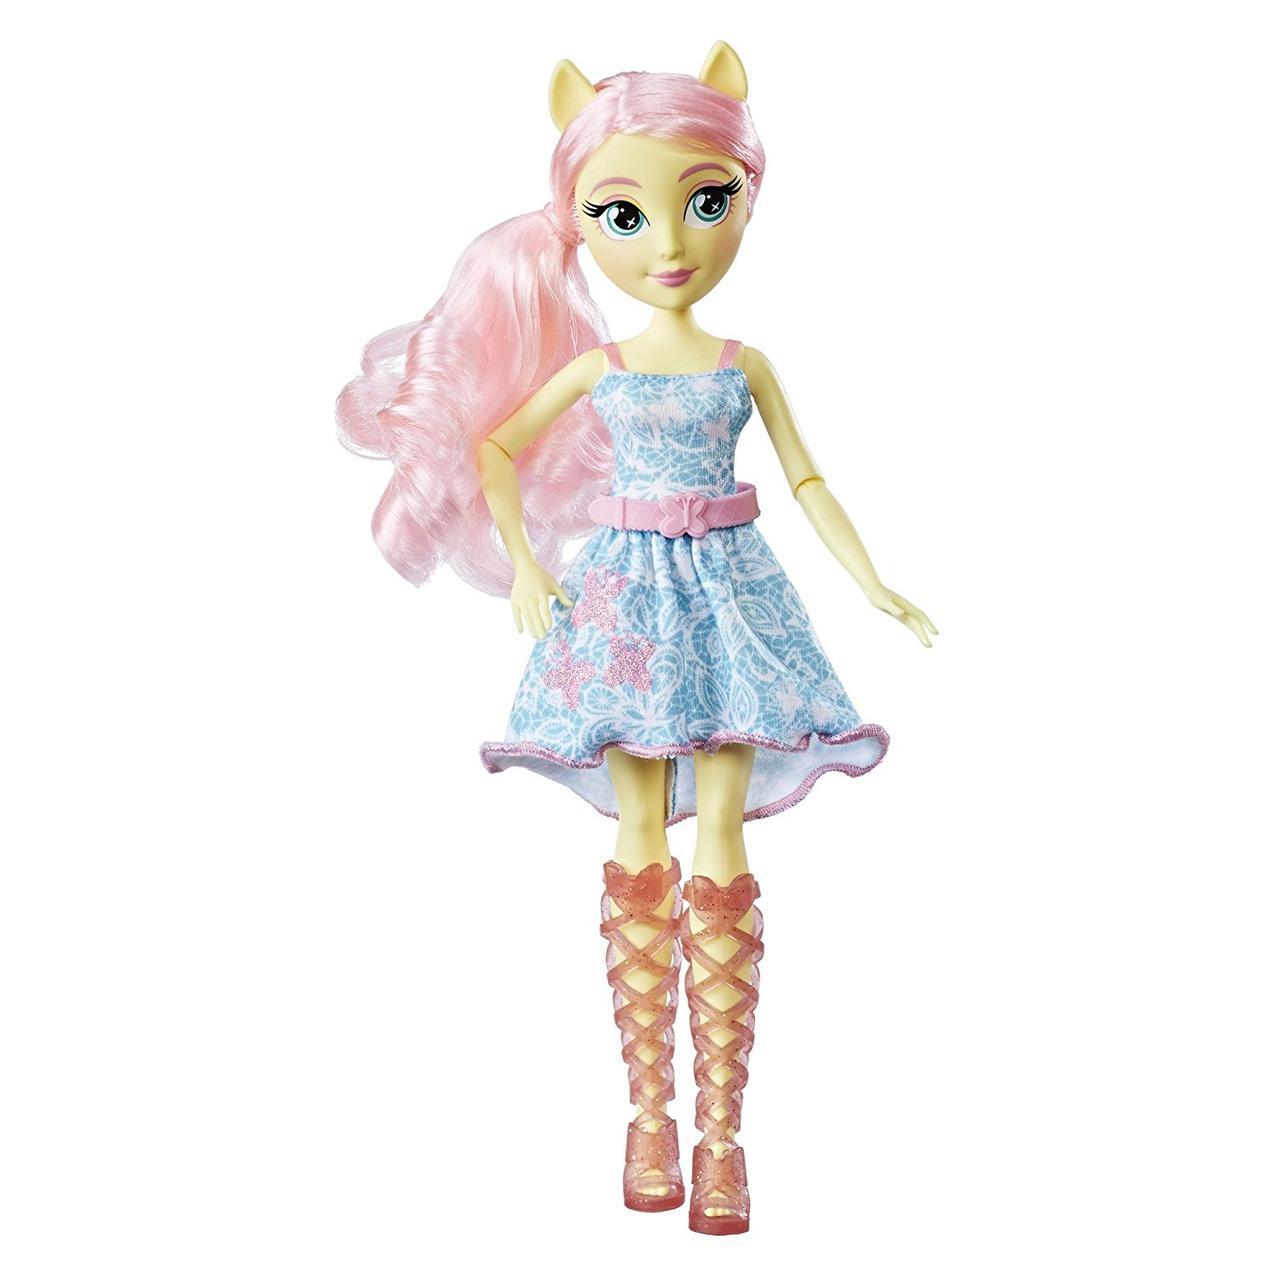 Кукла My Little Pony Equestria Girls Fluttershy Doll (Май Литтл Пони. Девочки из Эквестрии - Флаттершай)